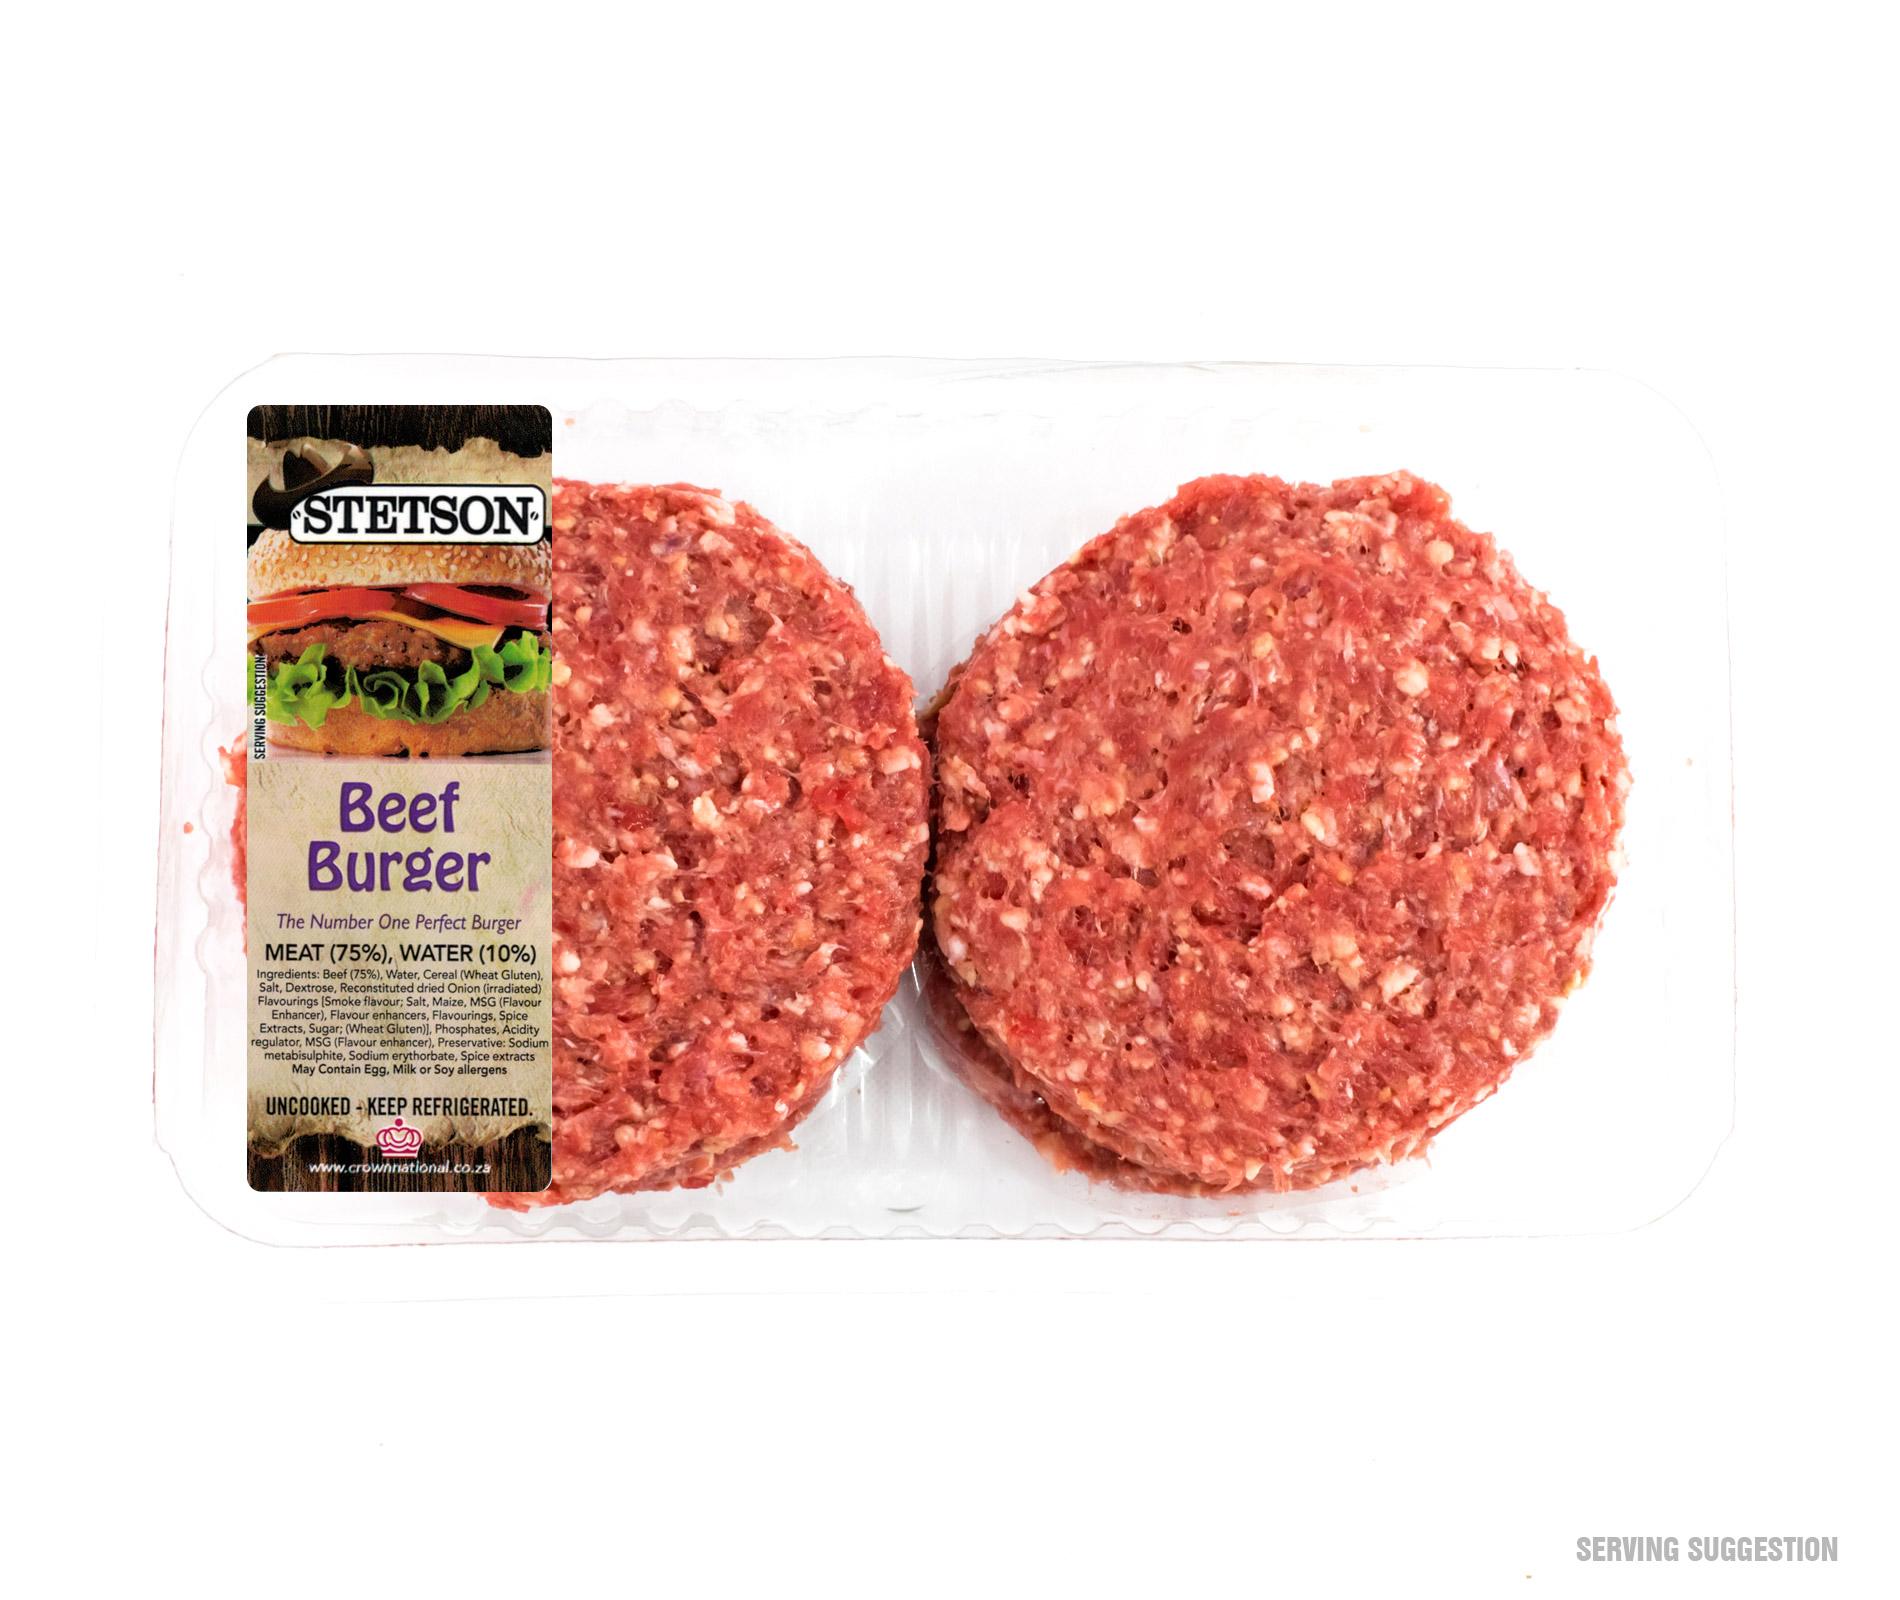 Stetson Beef Burger Patties - Fleisherei Online Butchery / Slaghuis